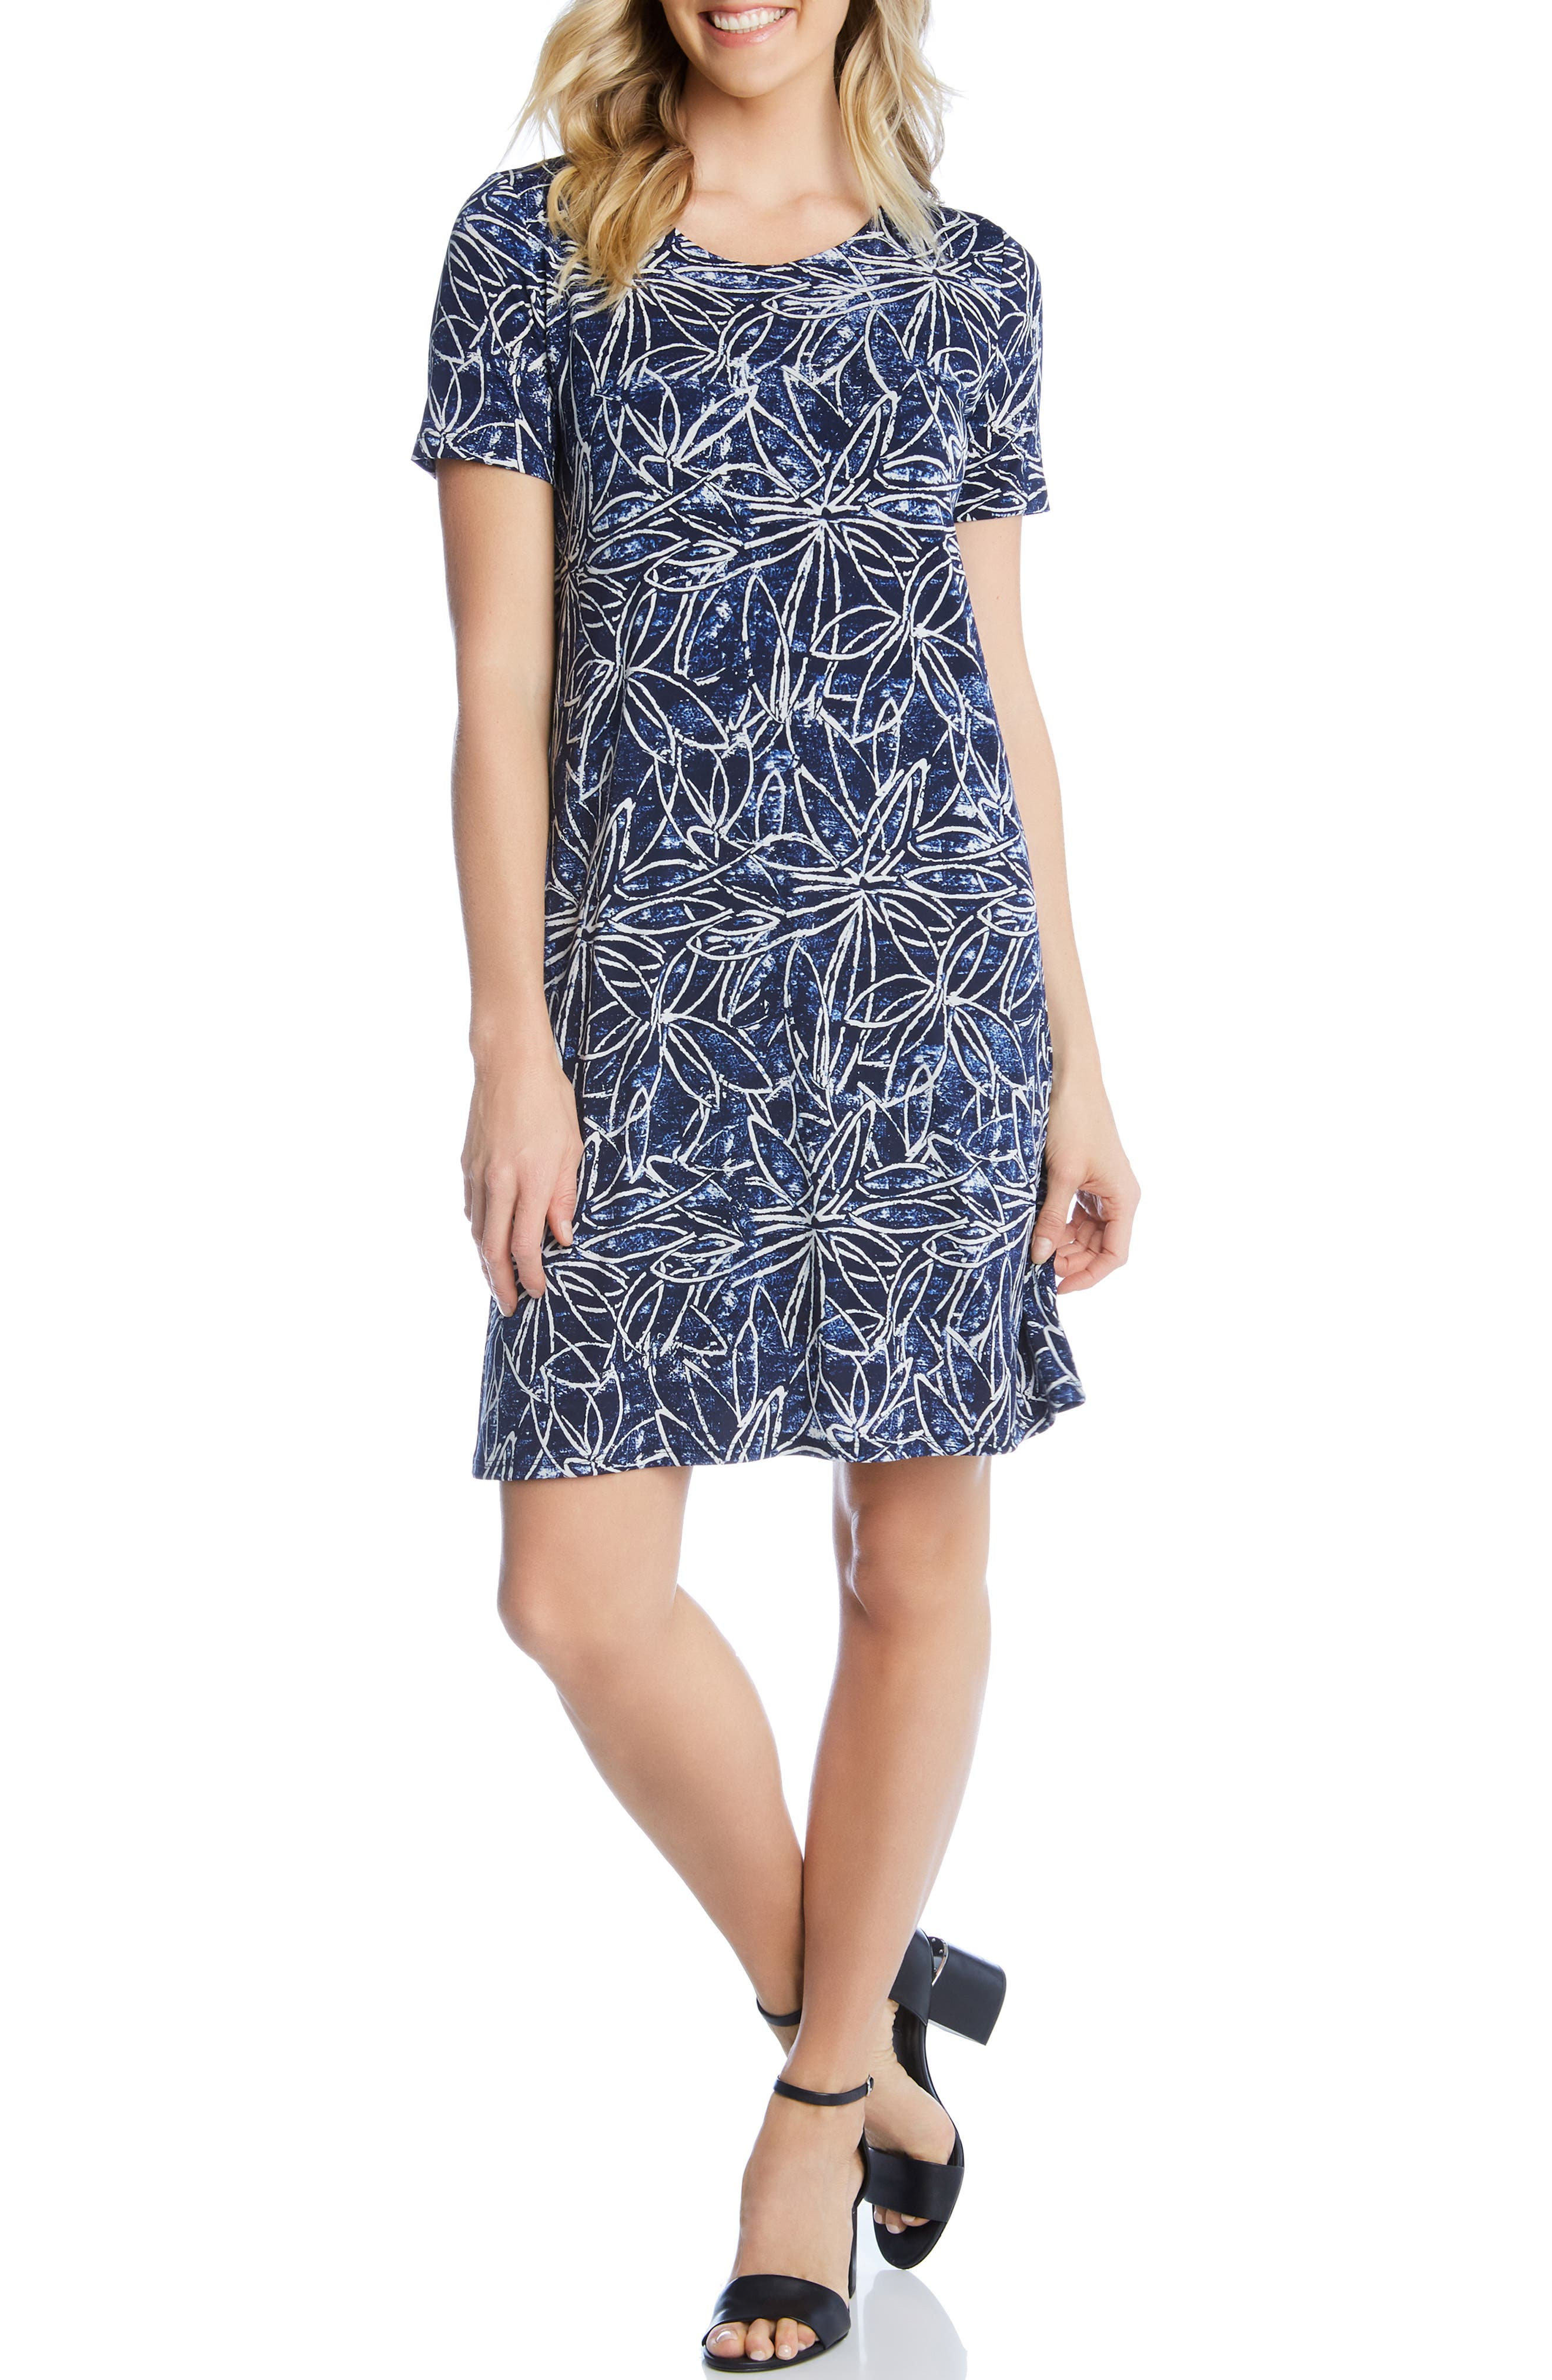 KAREN KANE Floral Print Shift Dress, Main, color, PRINT